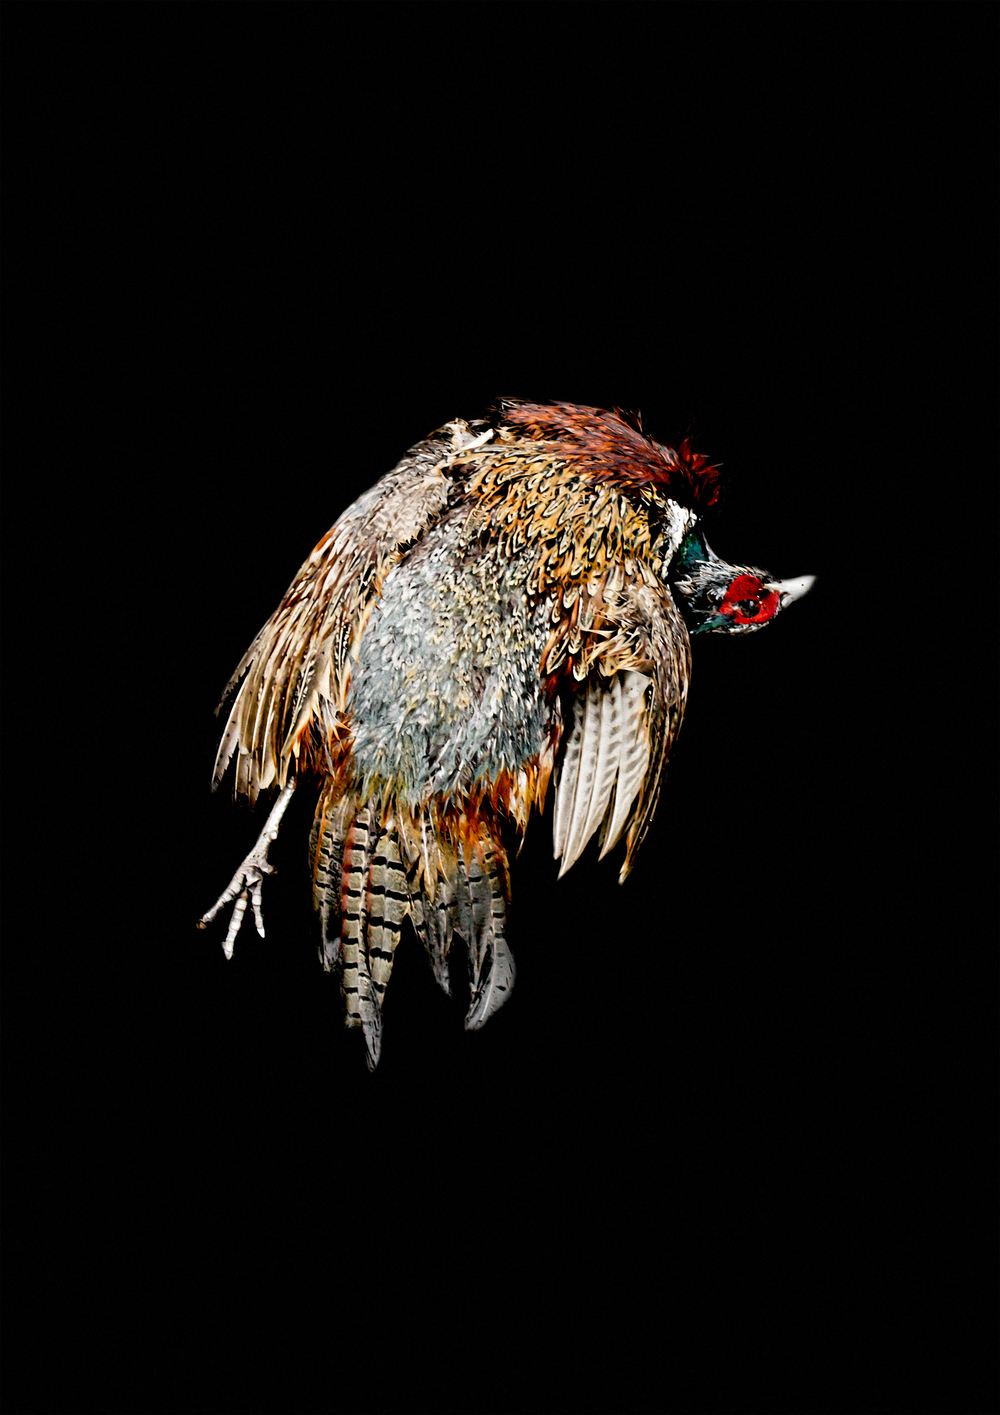 Carcass, fasaani, 2015. Karoliina Paappa